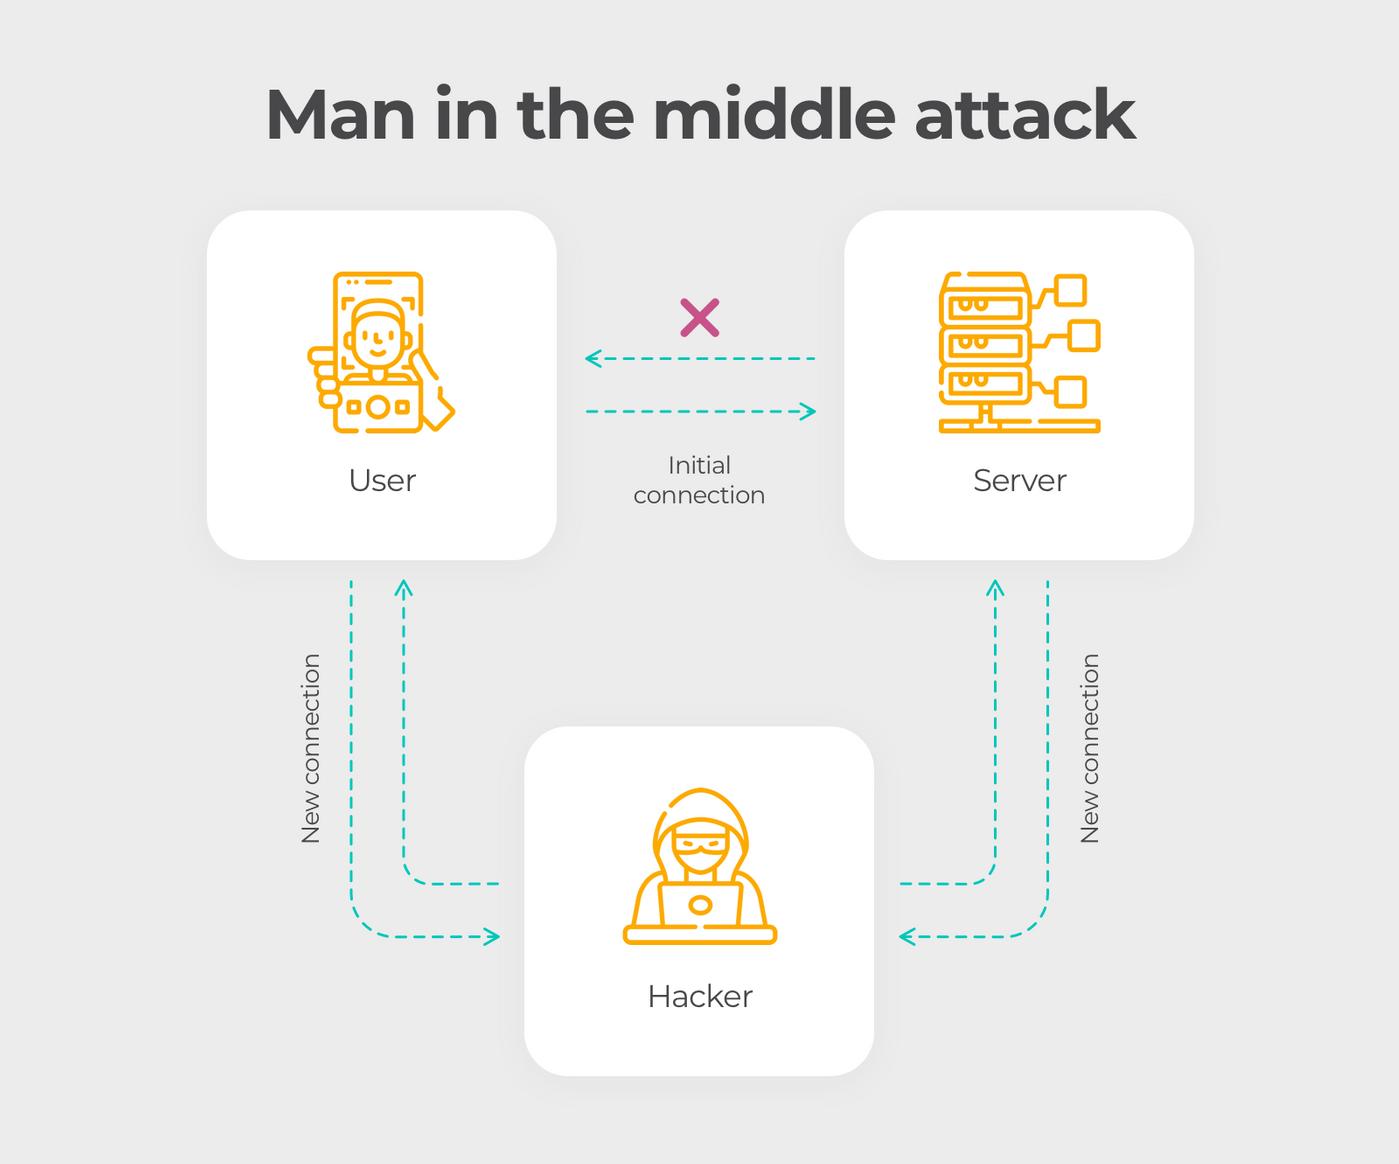 Cellular network vulnerabilities: MITM attack